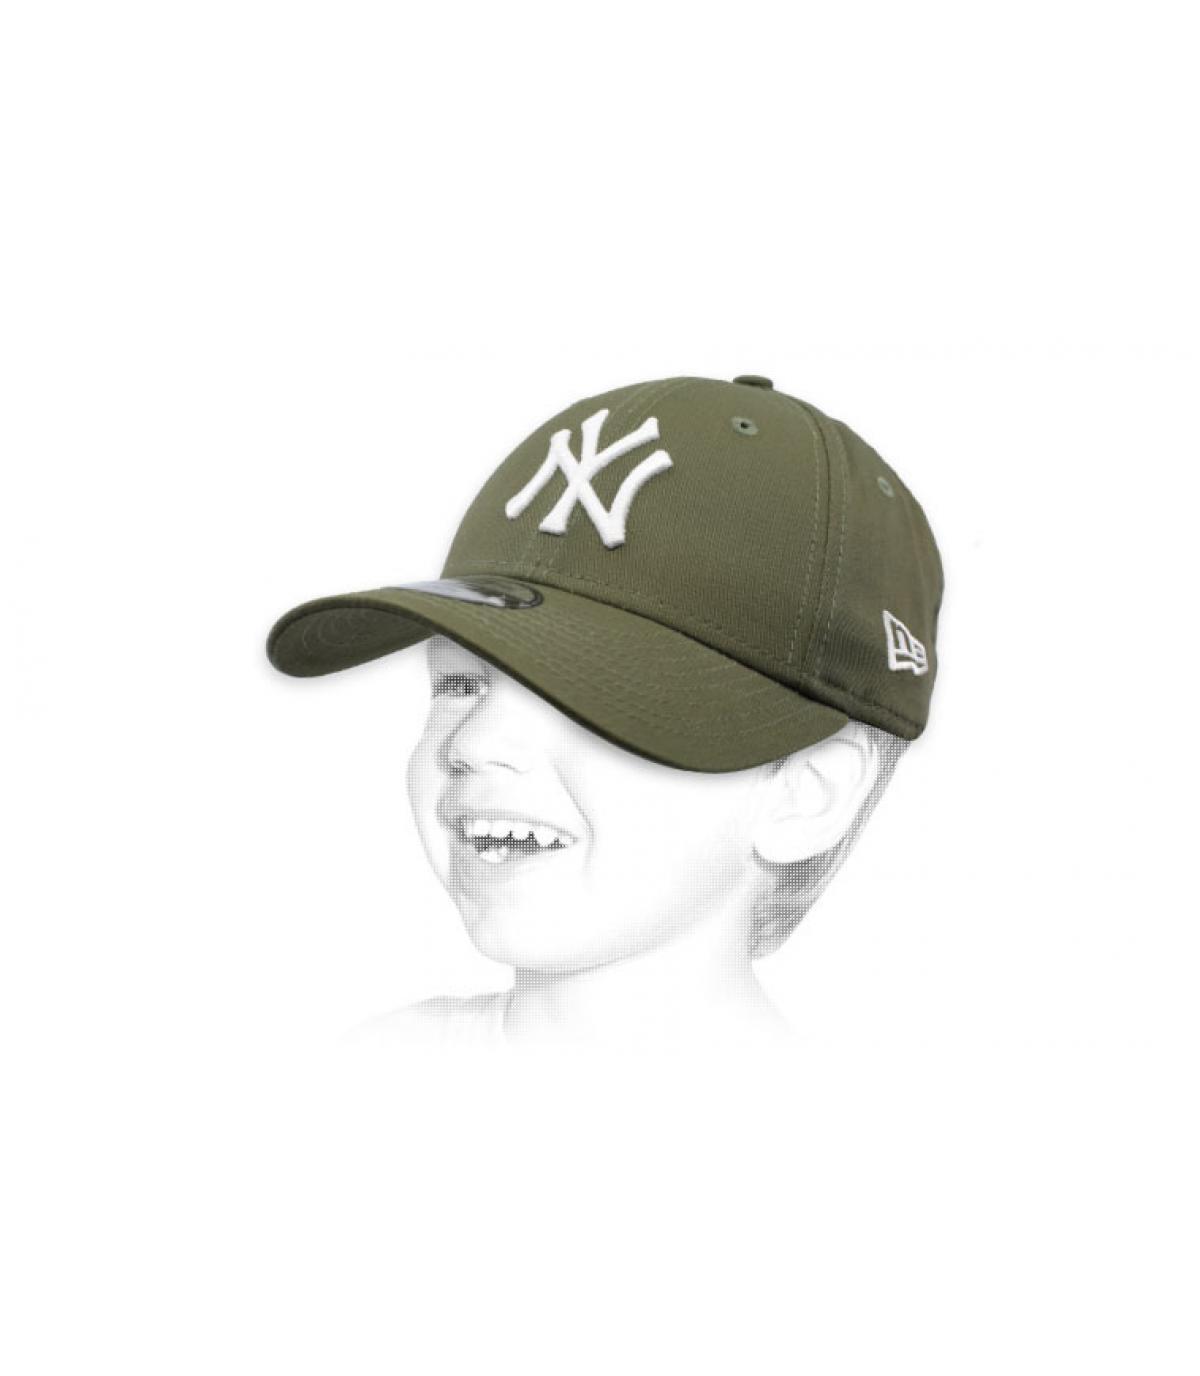 NY groen kinderpet